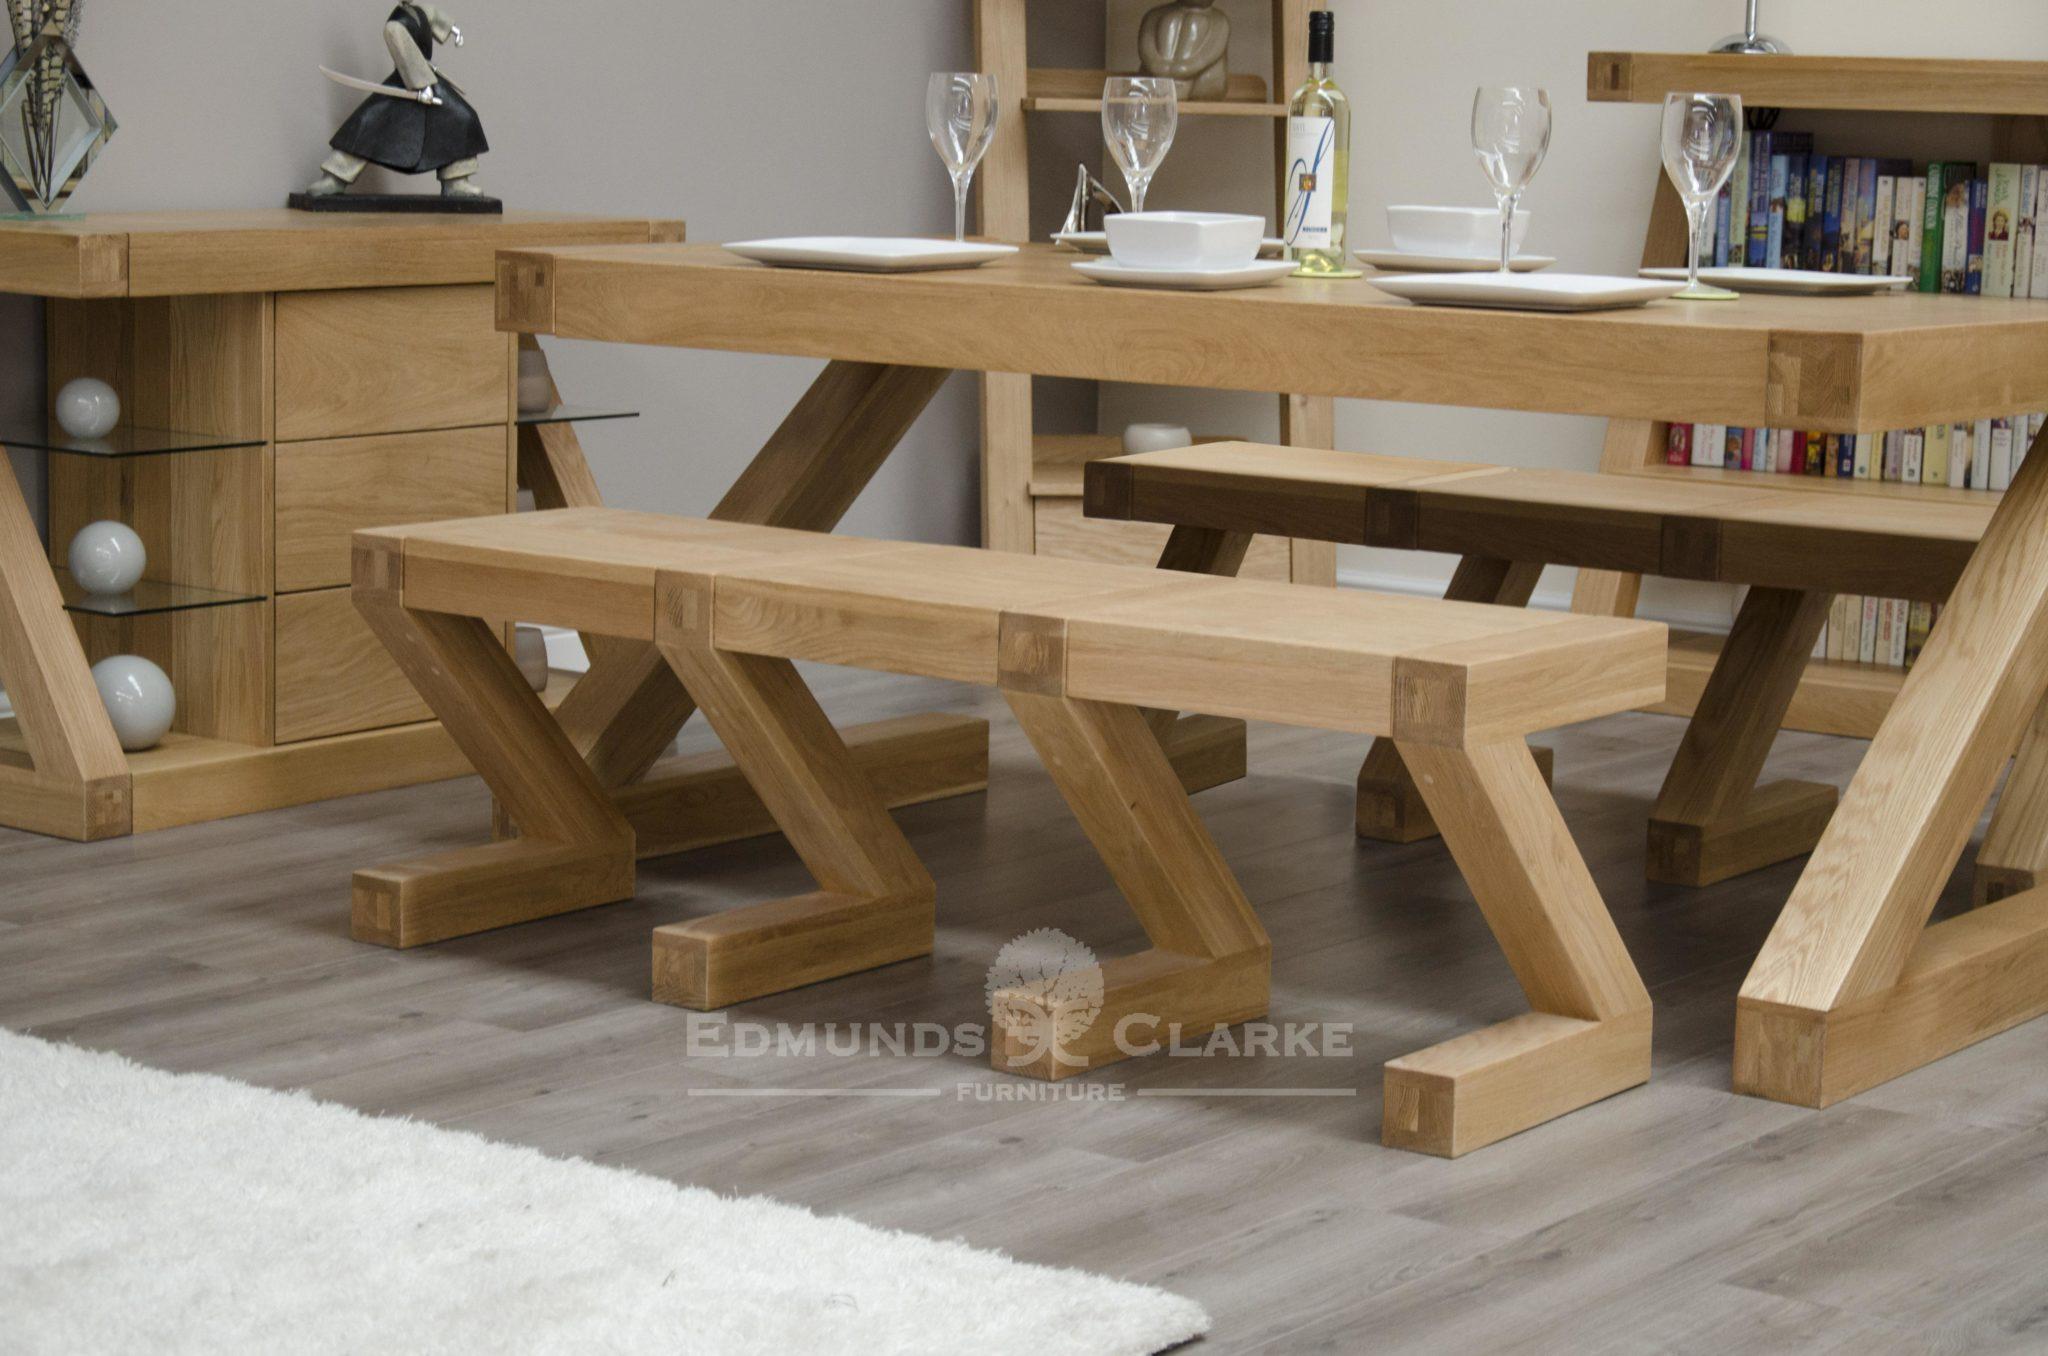 Z designer solid oak Z shaped large bench made for matching Z table